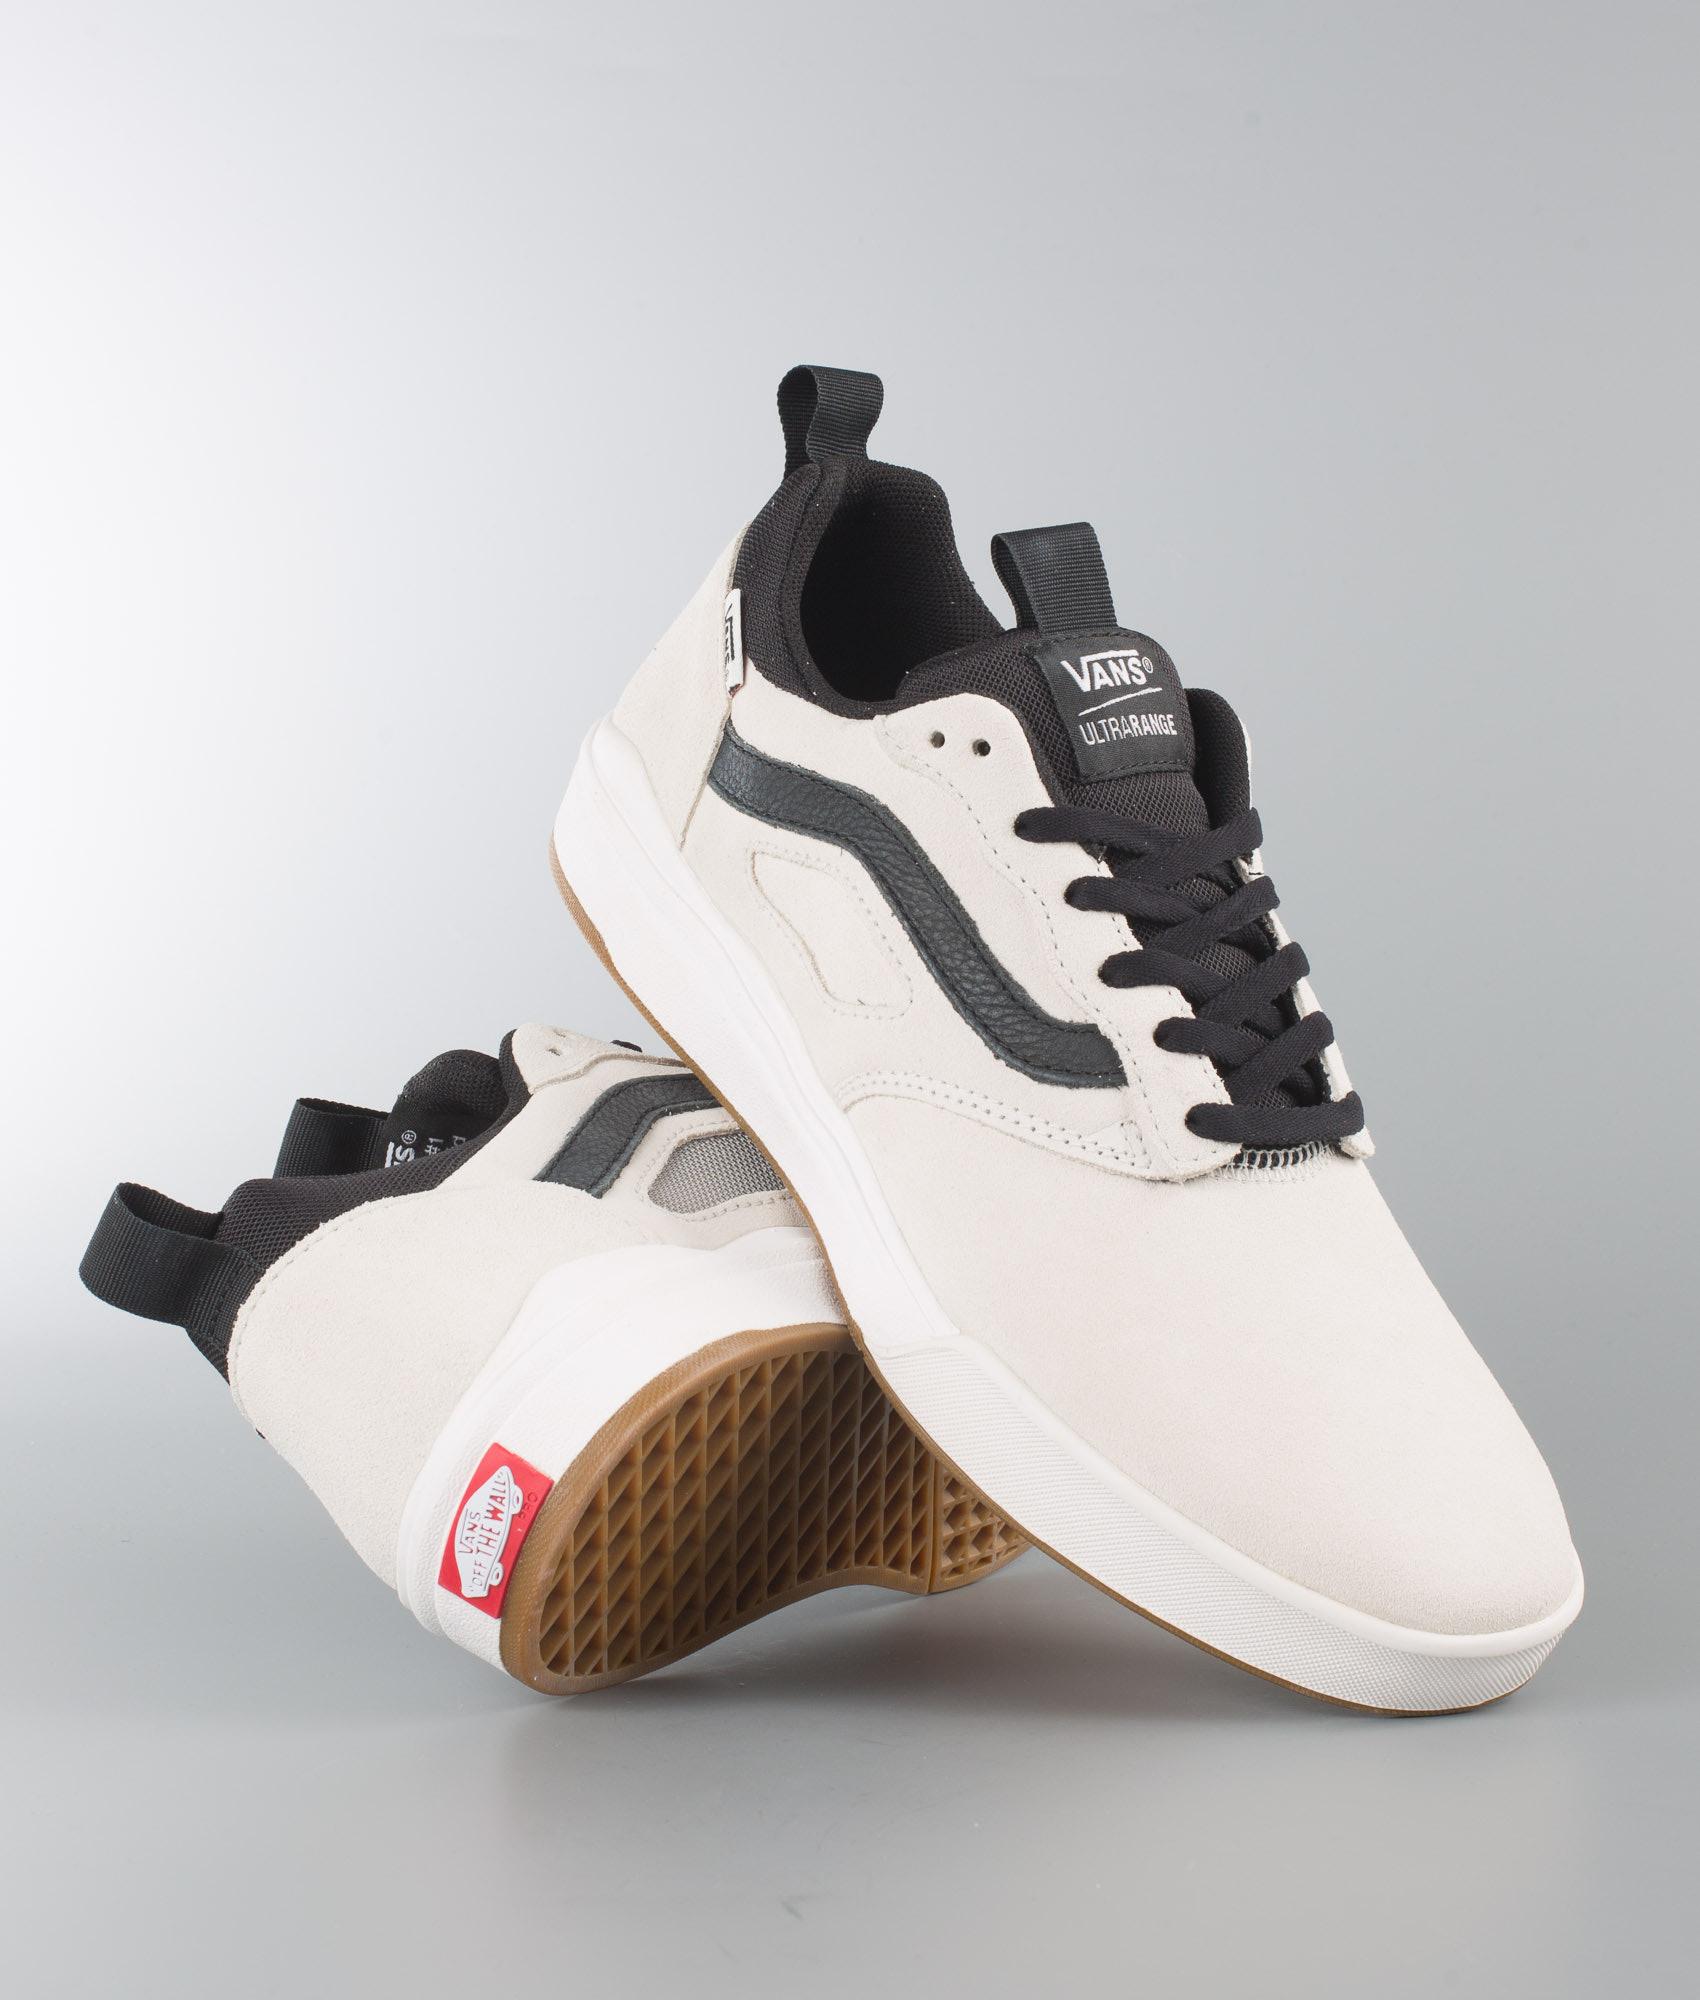 82117603ea Vans Ultrarange Pro Shoes Blanc Black - Ridestore.com